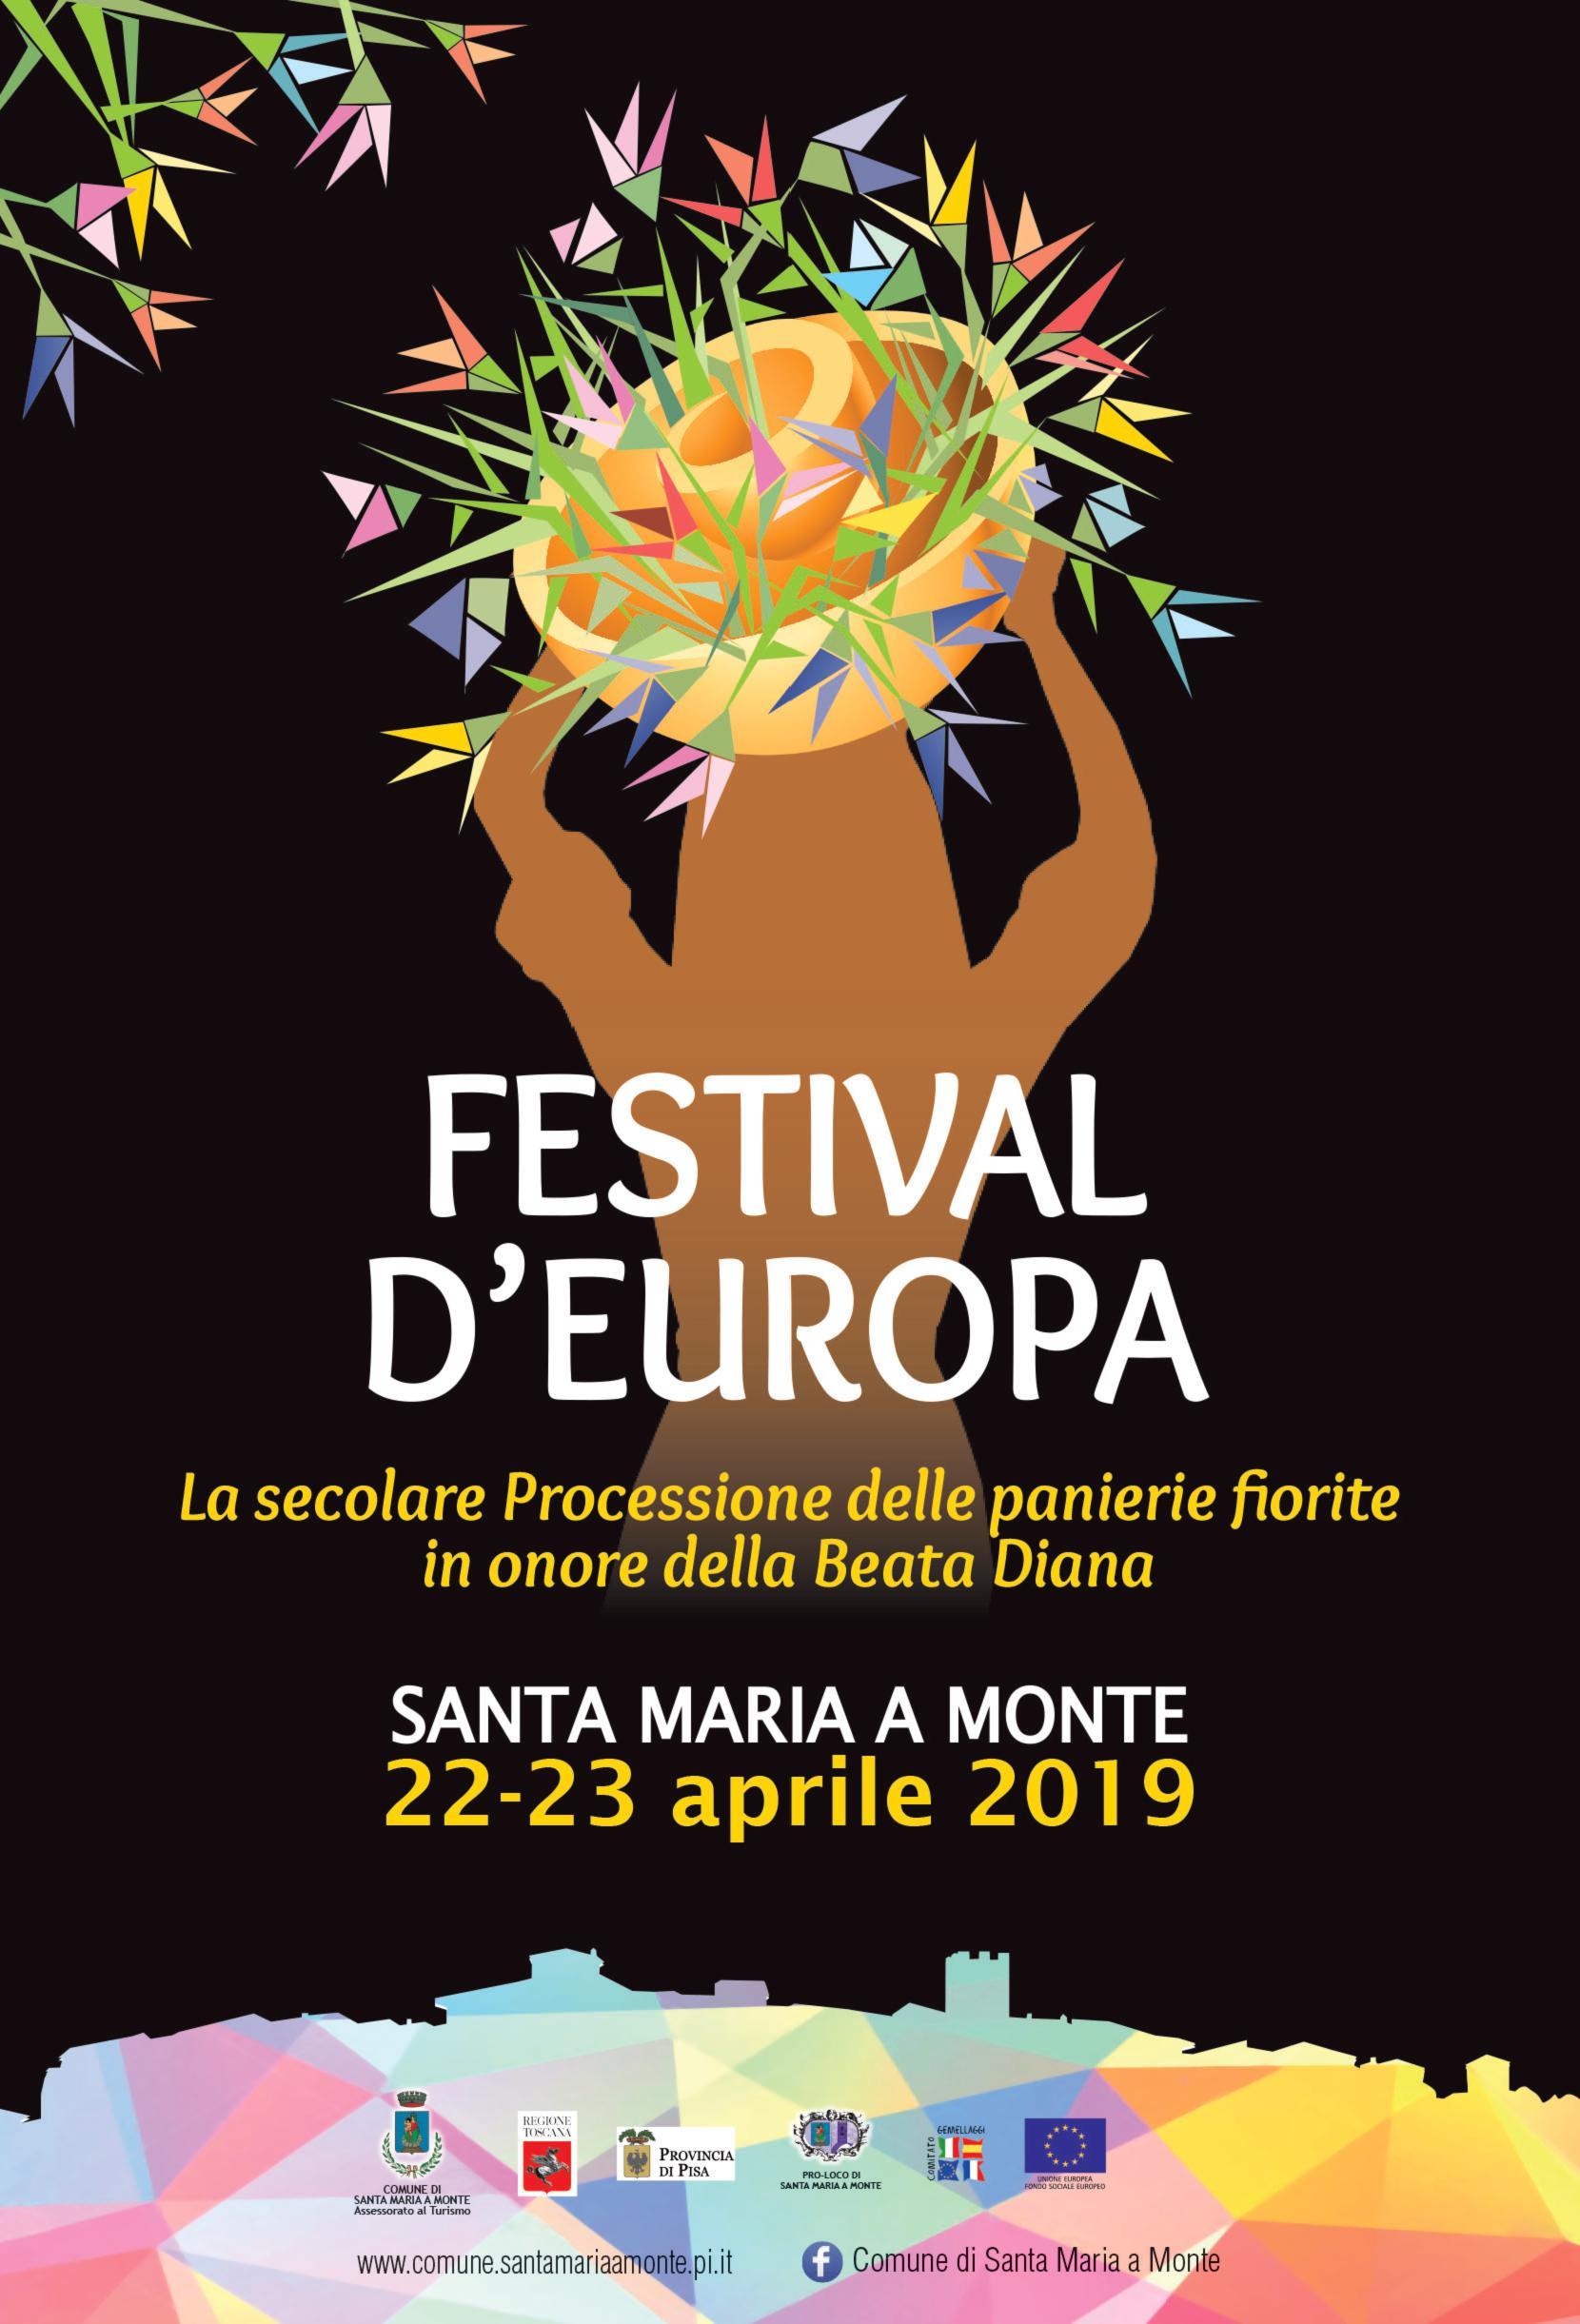 Festival d'Europa 2019 - Lunedì 22 e Martedì 23 Aprile